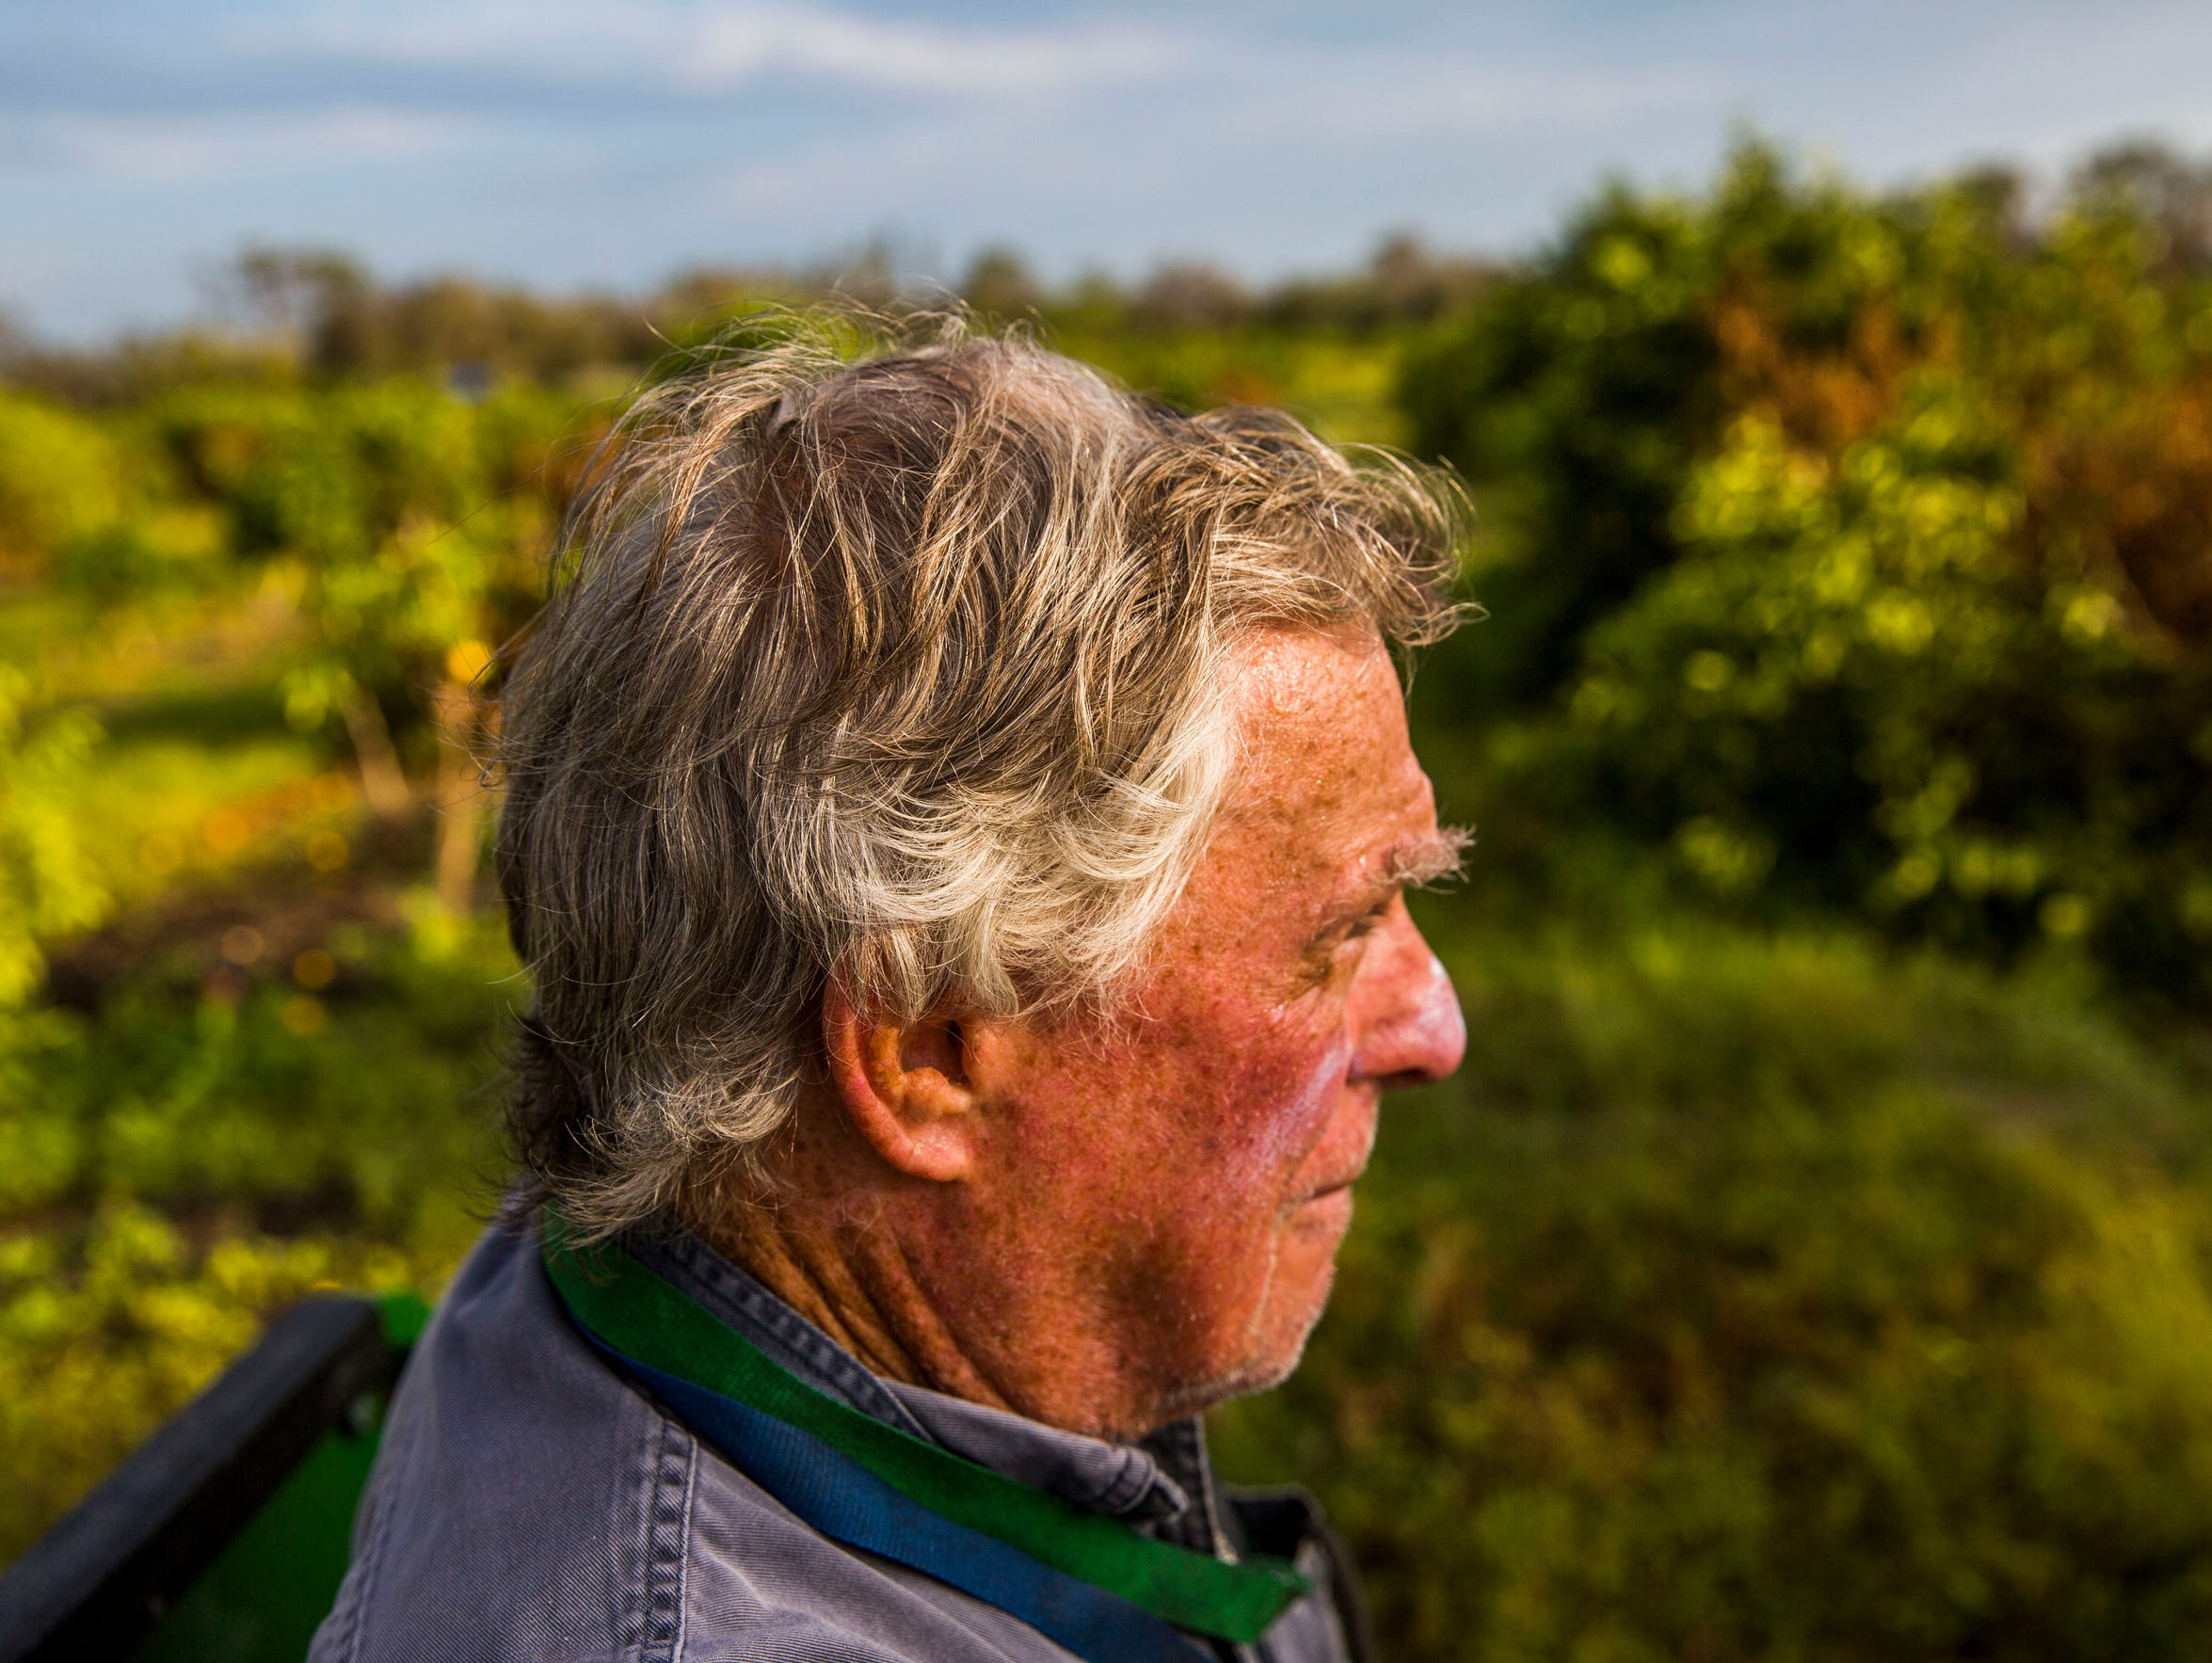 Martin Mason, 75, examines his citrus trees on his